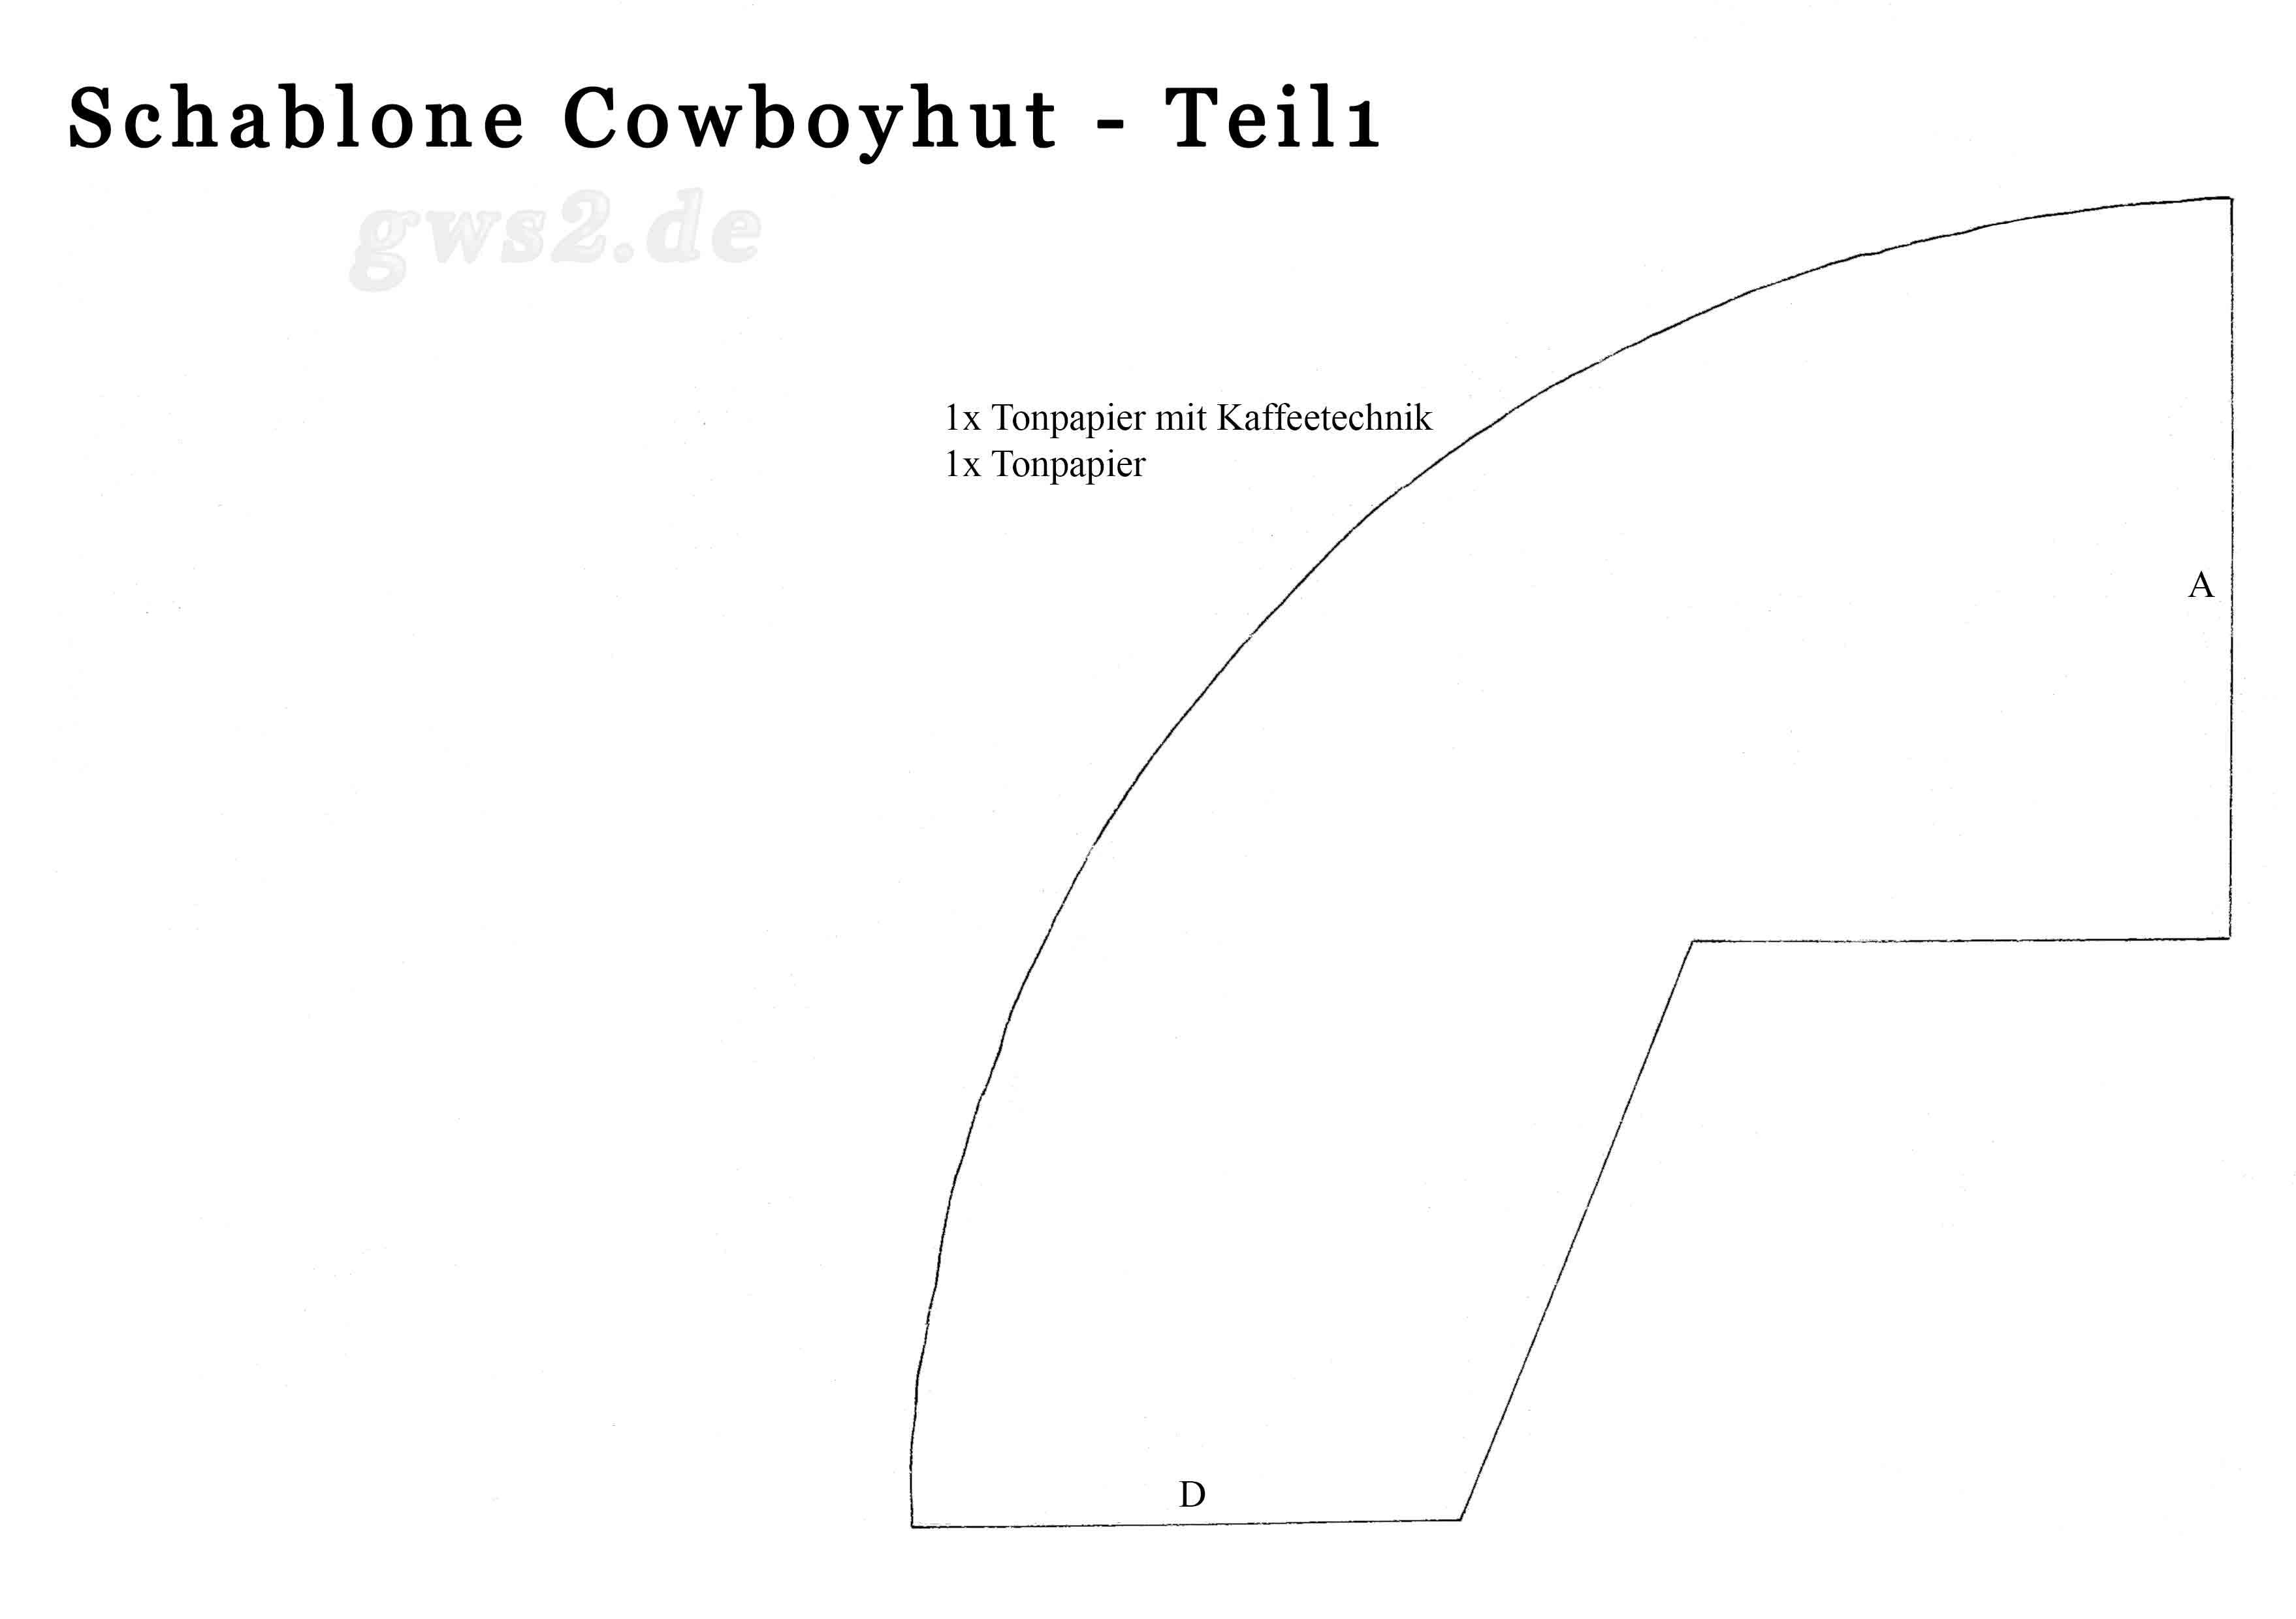 Cowboyhut zum Aufsetzen - Bastelanleitung